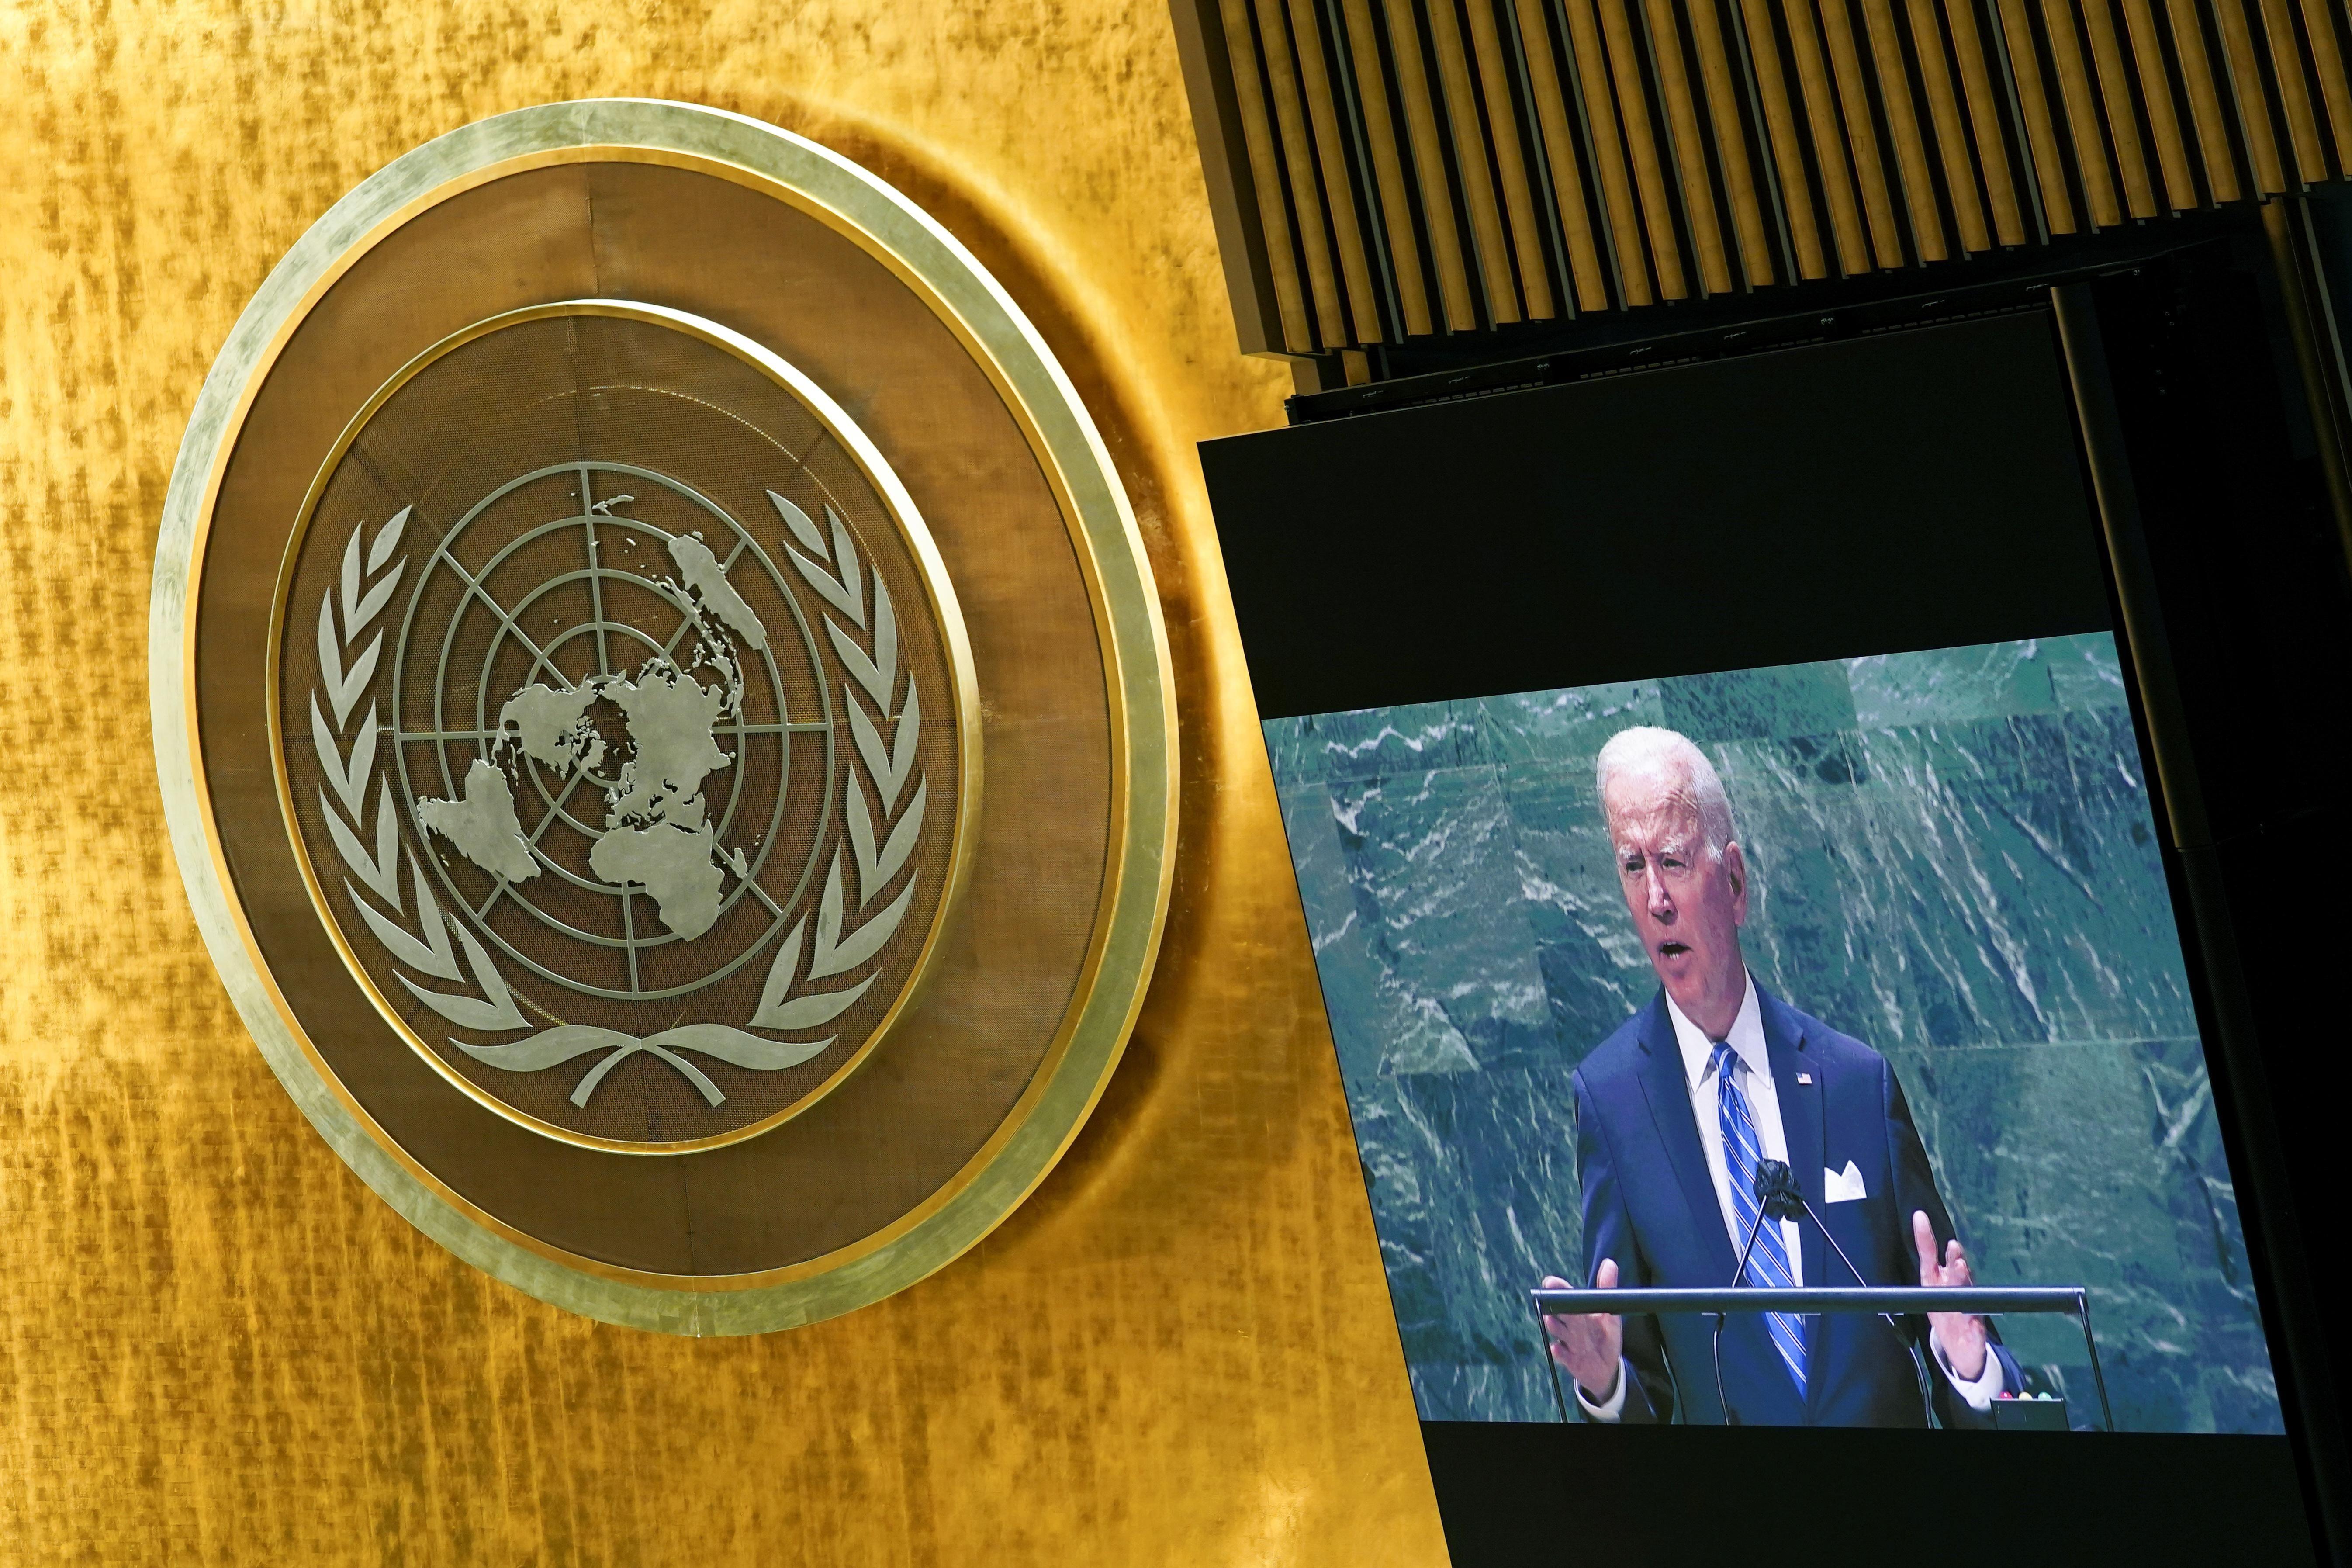 U.S. President Joe Biden addresses the 76th Session of the U.N. General Assembly in New York City, U.S., September 21, 2021